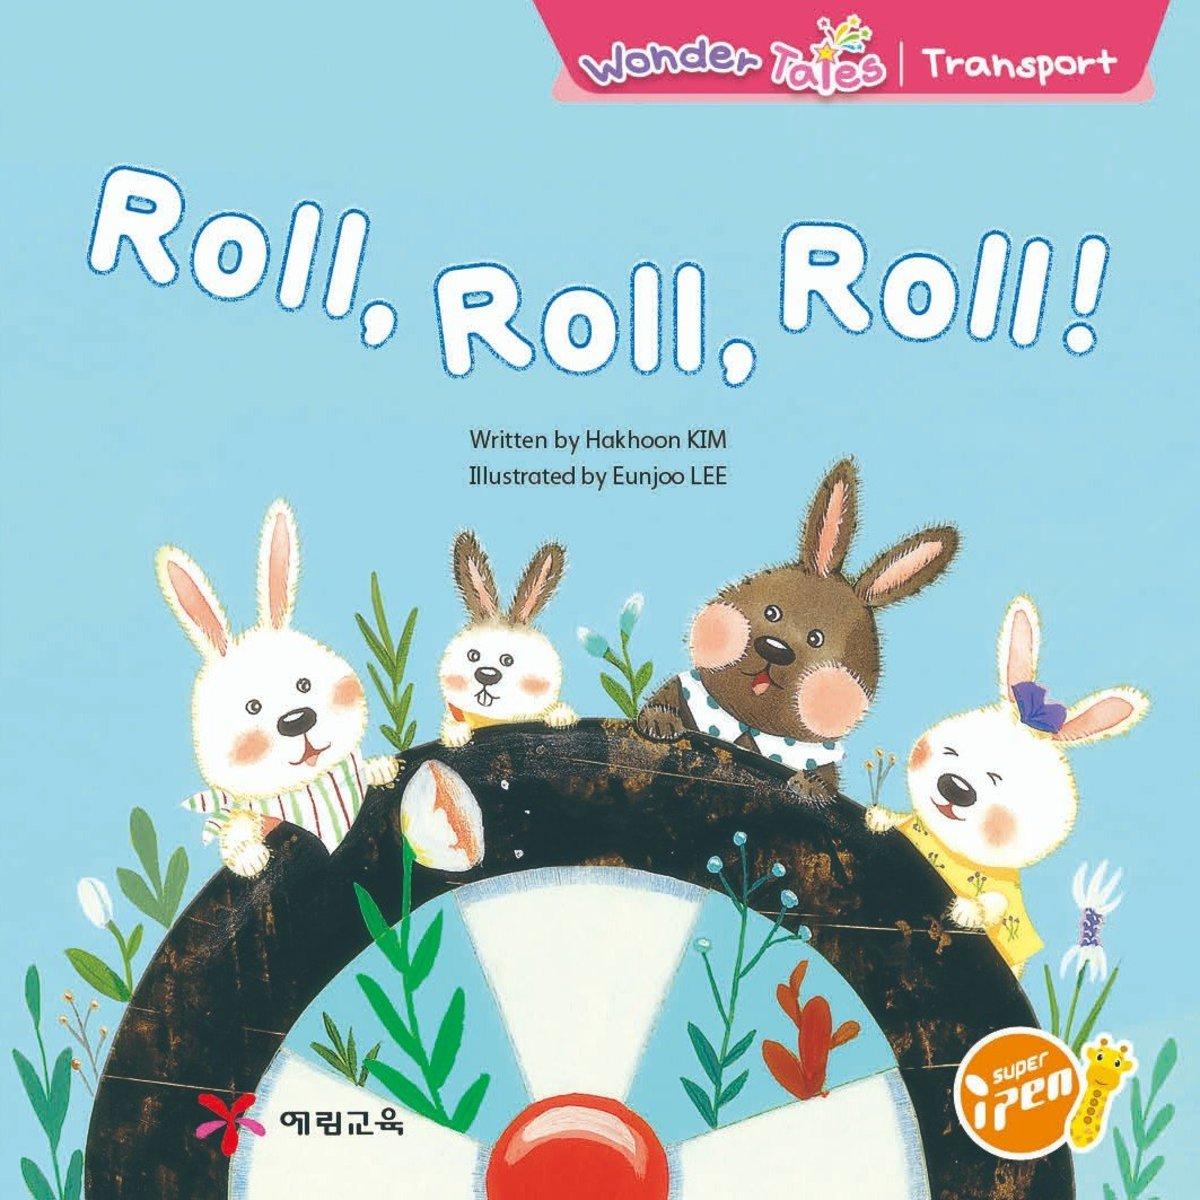 Wonder Tales 英文繪本 (K1)—Roll, Roll, Roll!